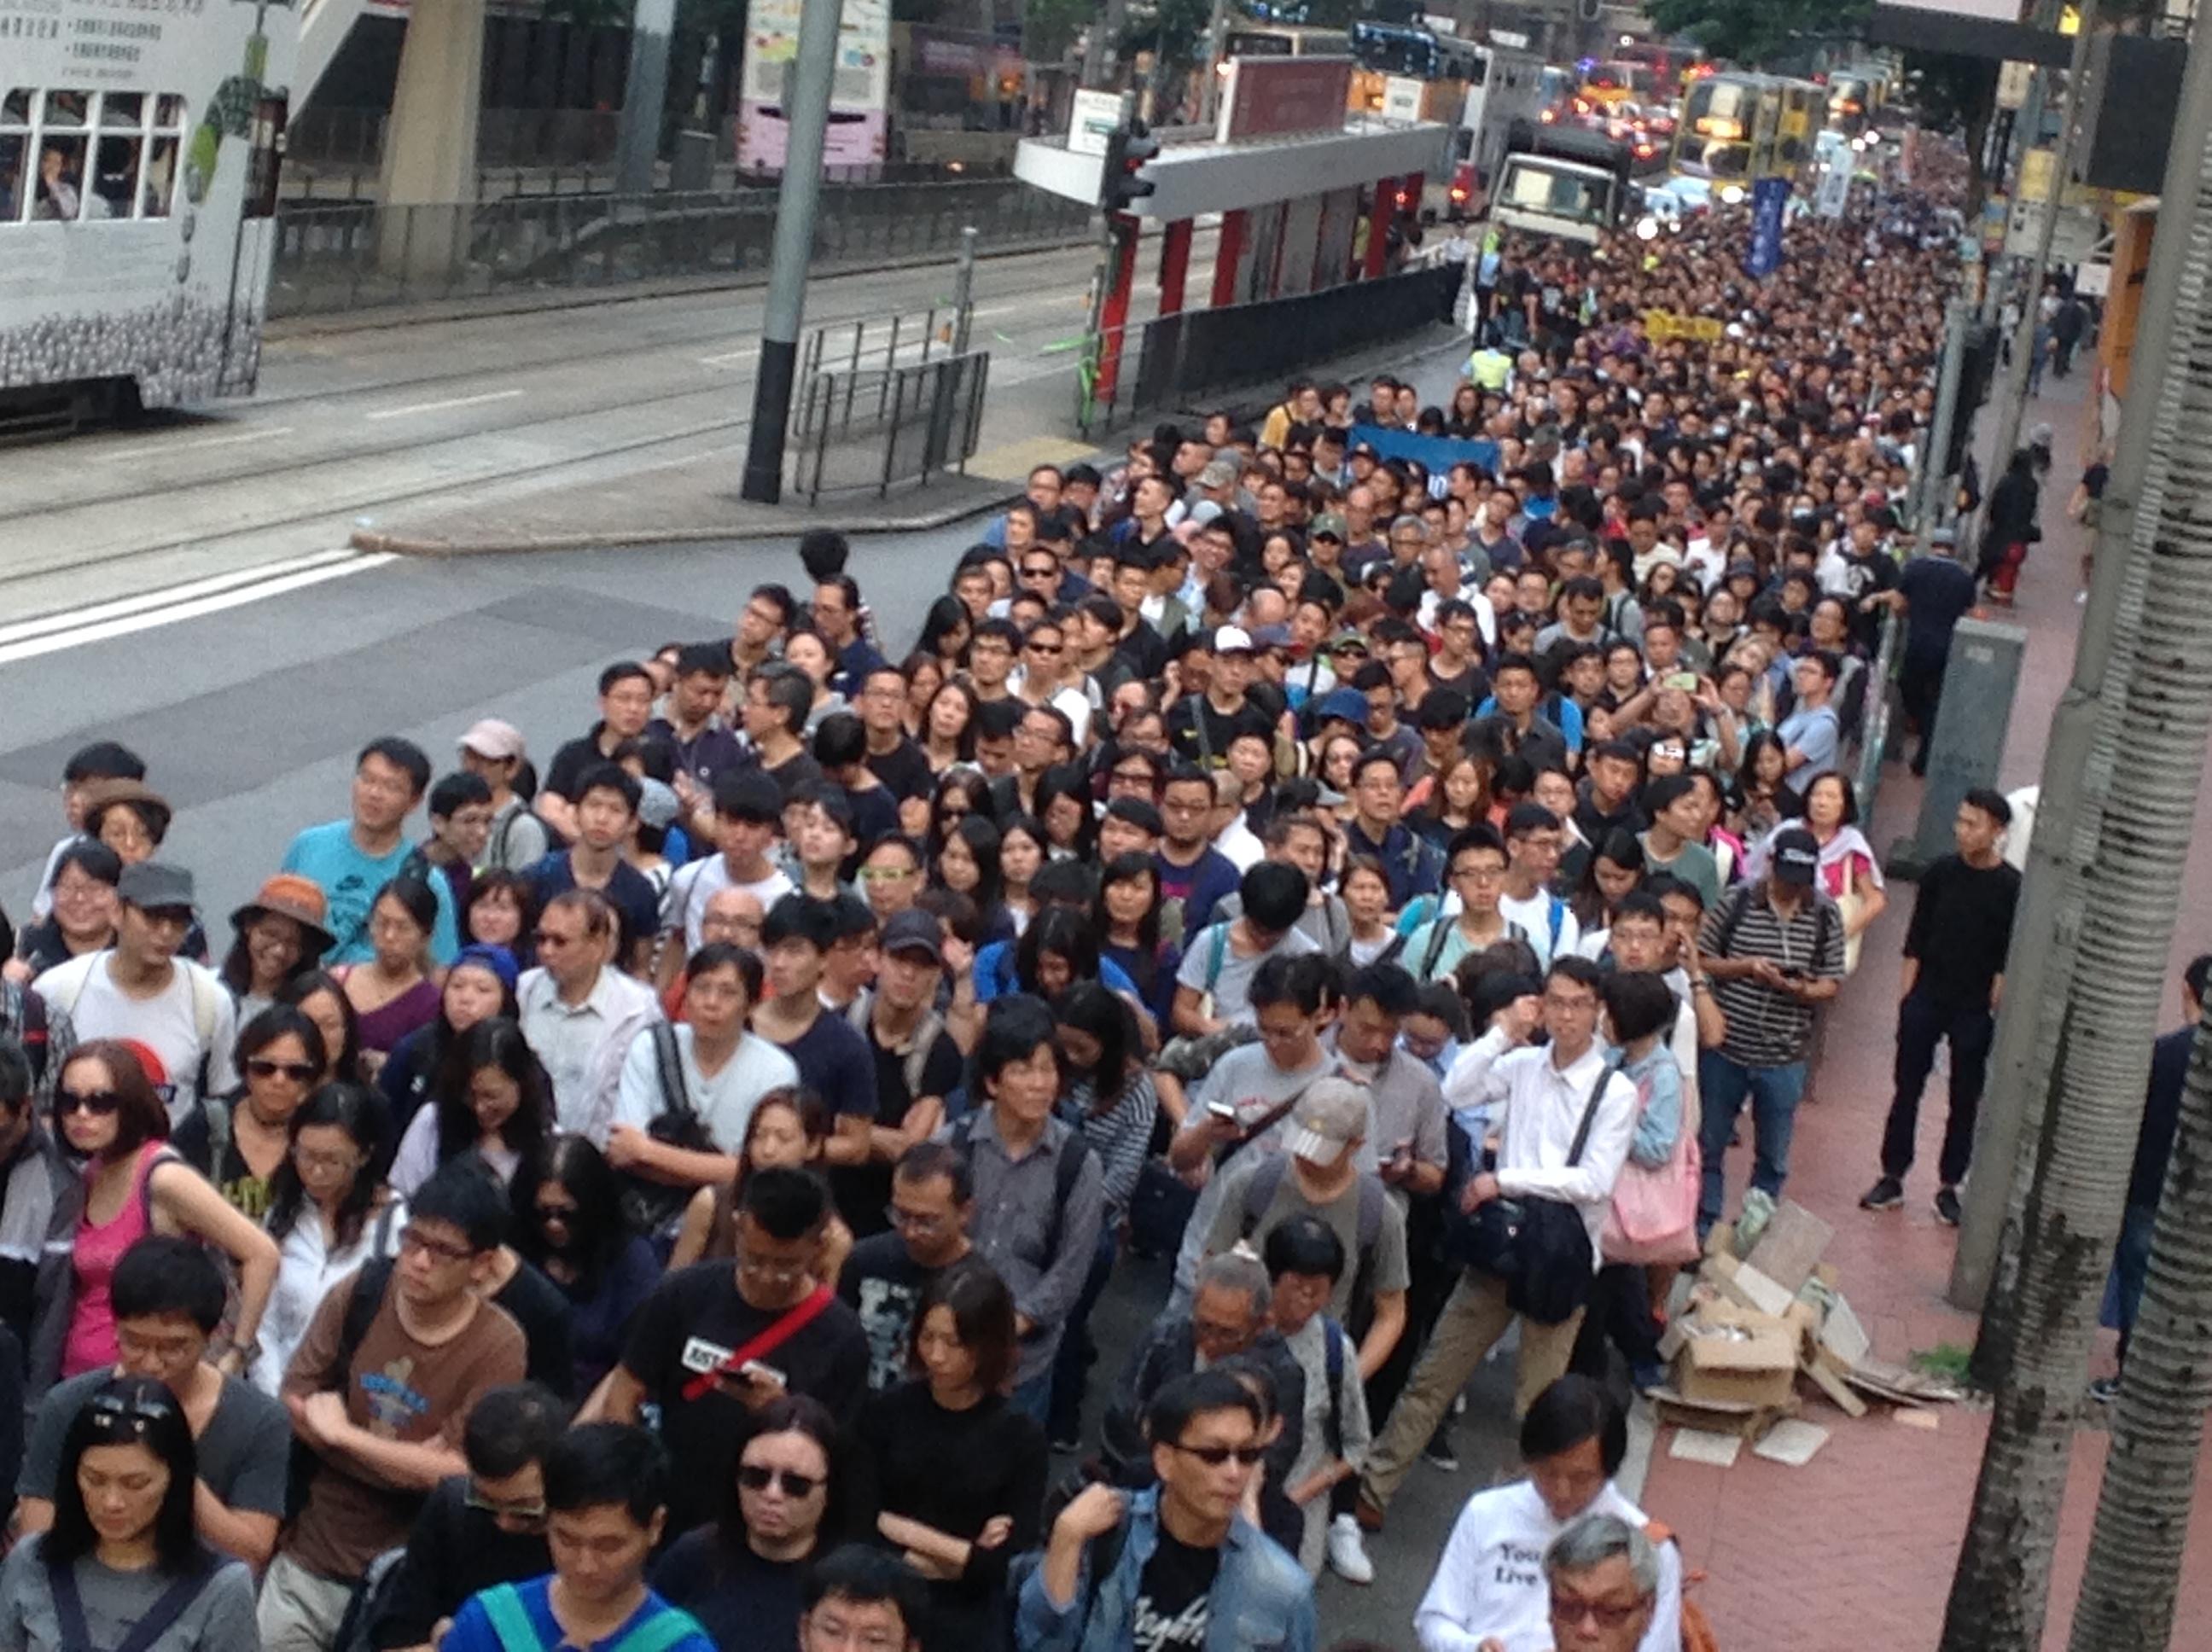 File:香港各界發起反人大釋法大遊行和集會 25.jpg - Wikimedia Commons